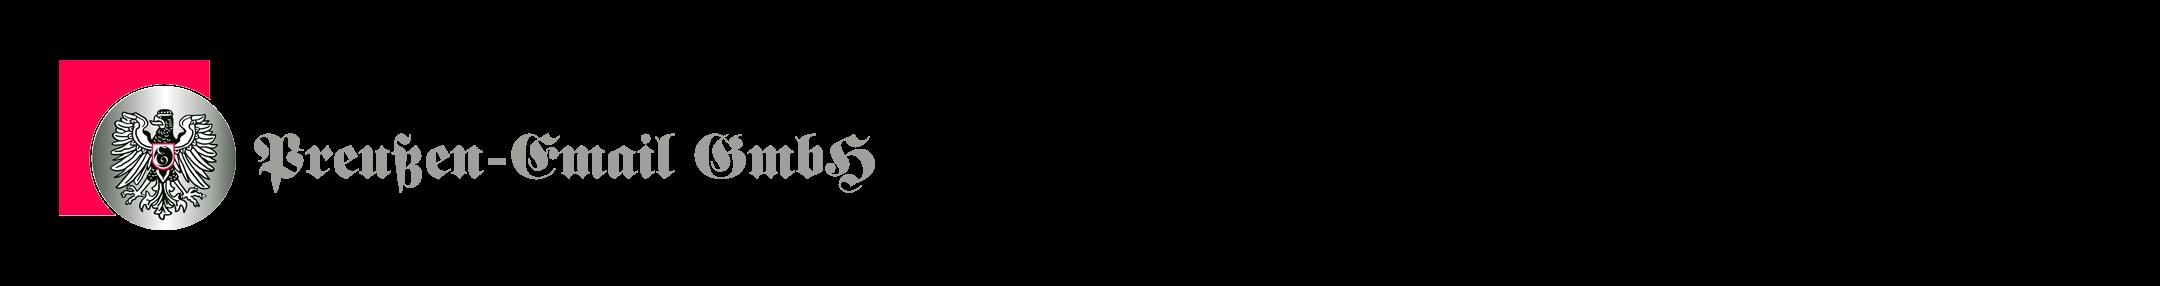 Preussen-Email GmbH